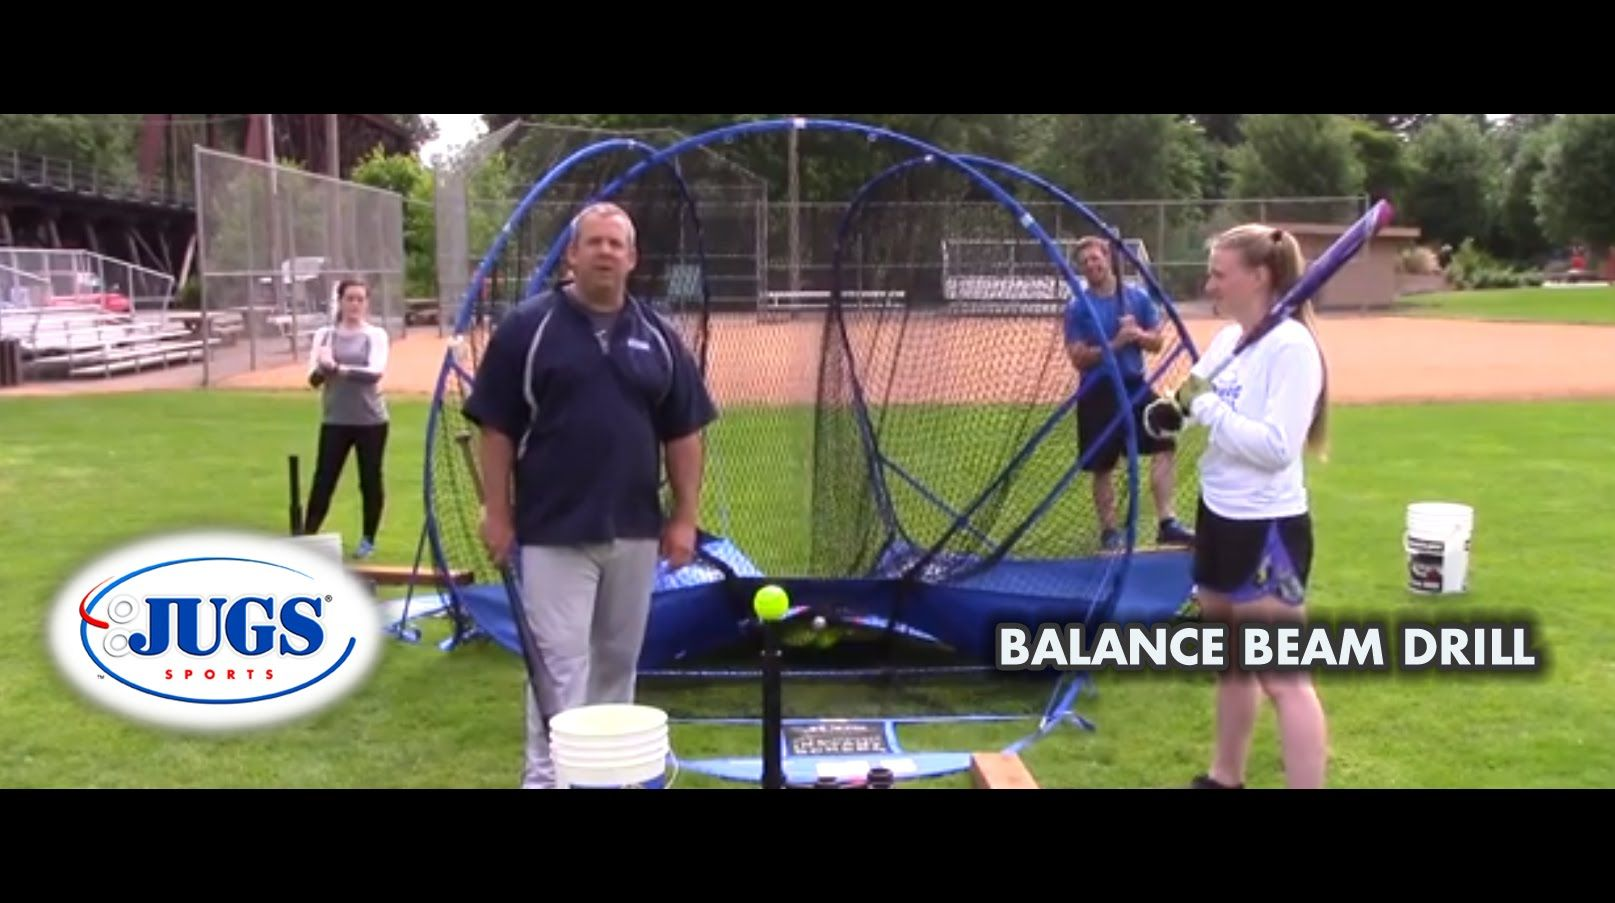 Drill 5 Balance Beam Balance Beam Baseball Drills Drill